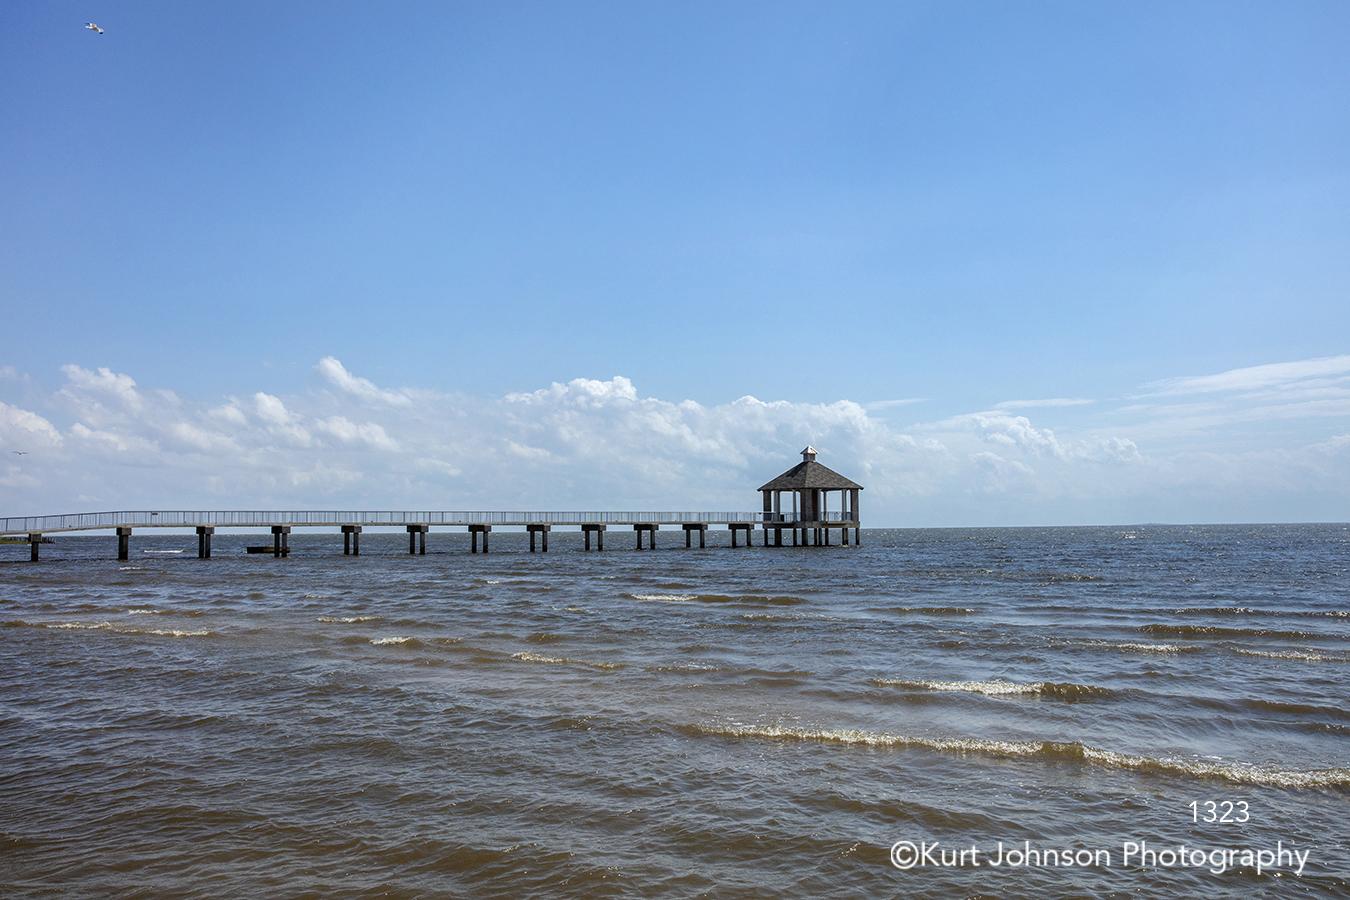 water pier waterscape waves calm blue boardwalk south southwest sky clouds